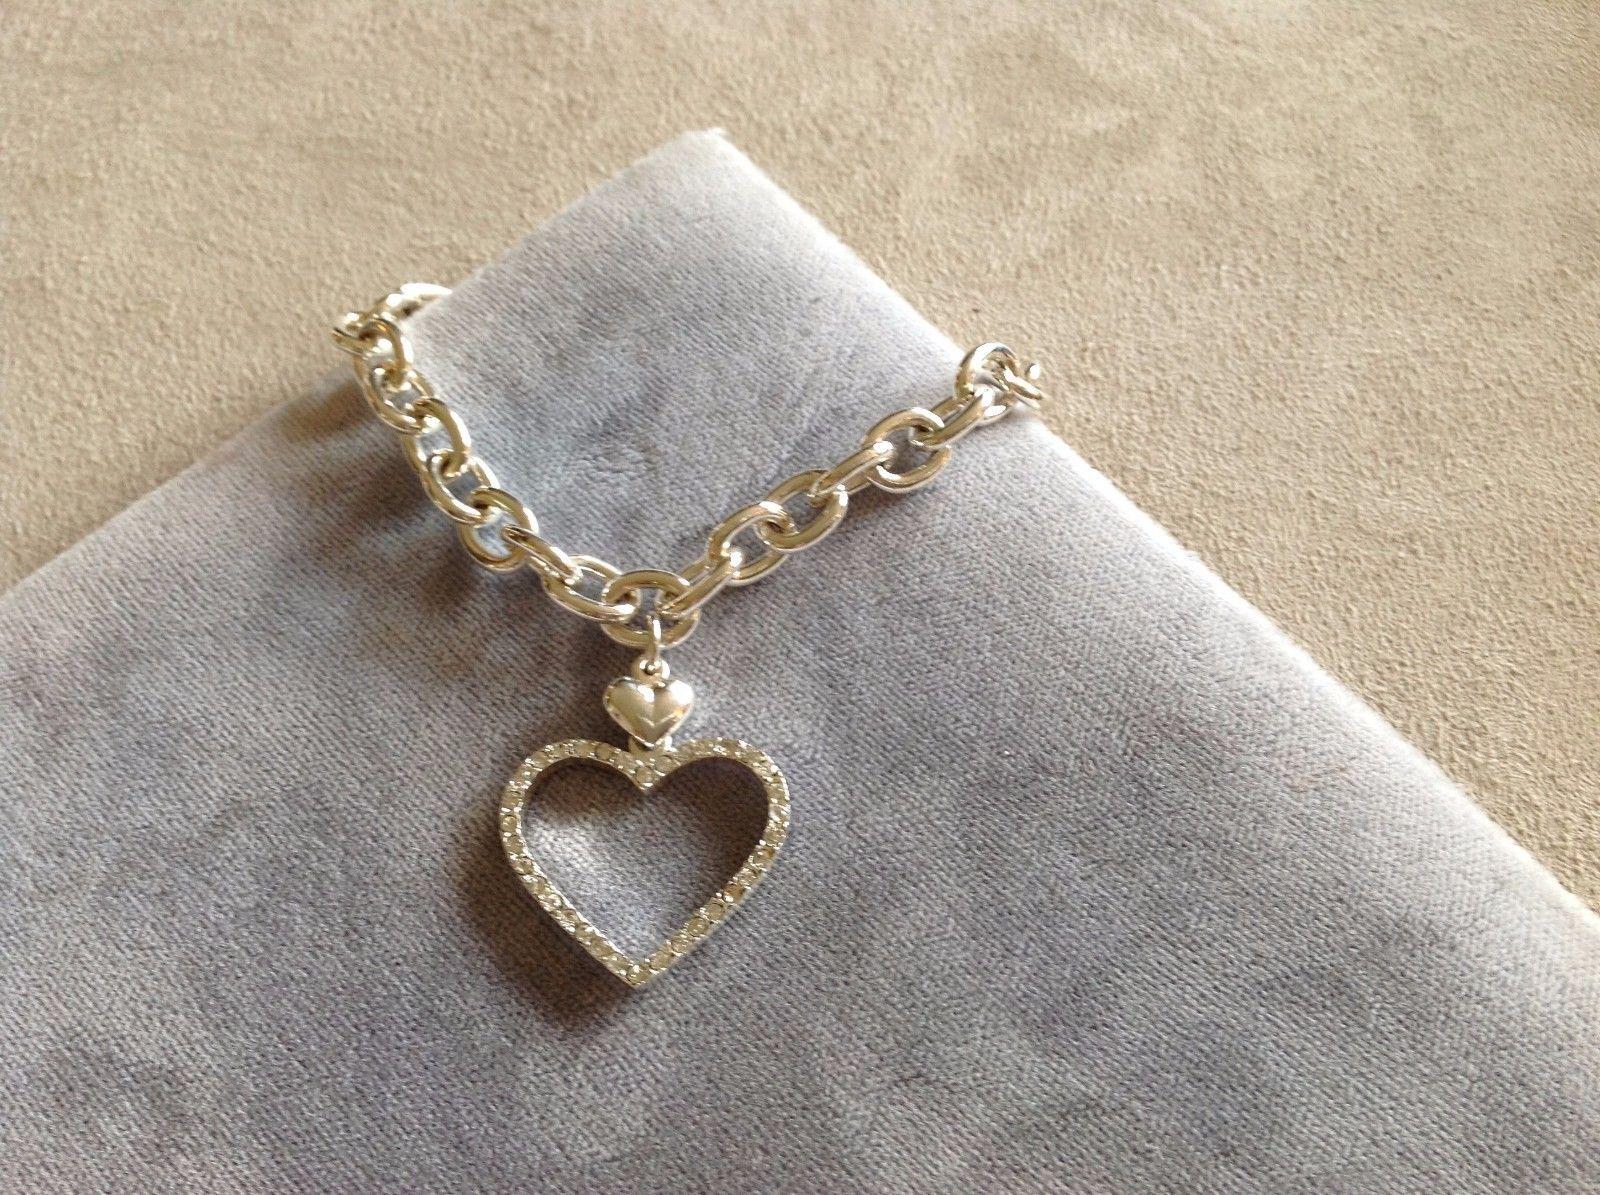 New Allure Studded Heart Charm Bracelet Silver Toned